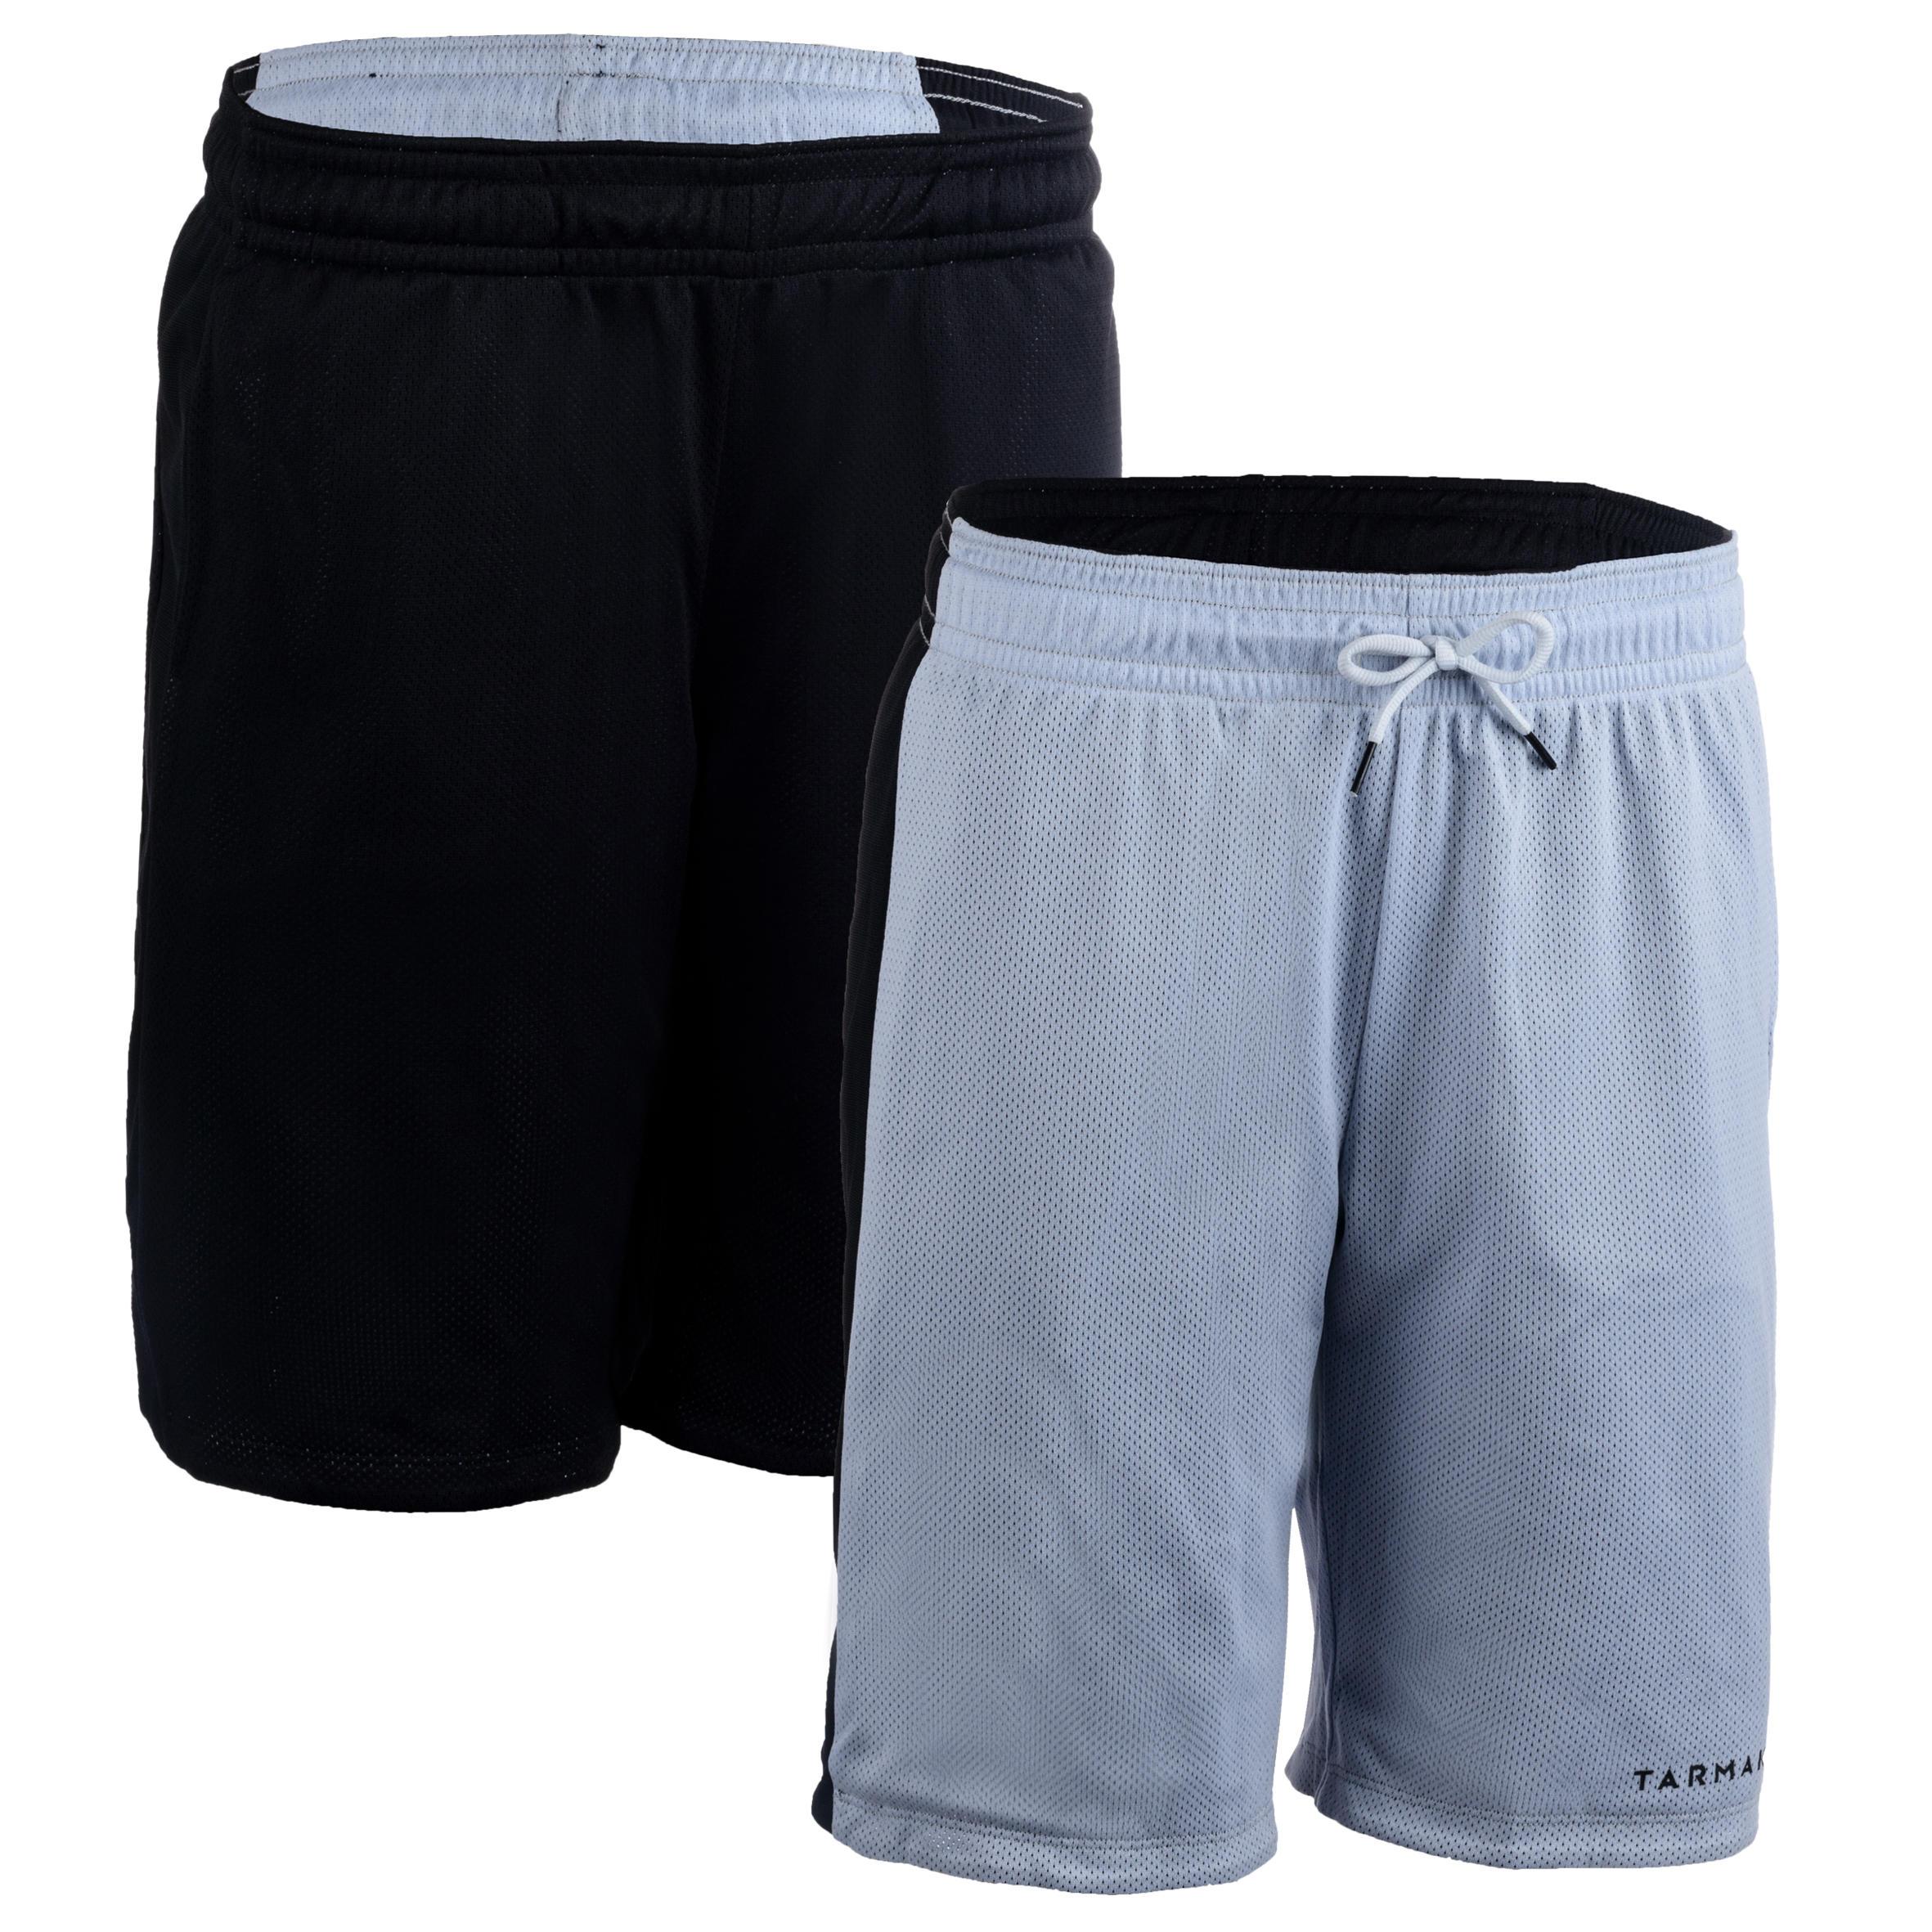 Basketballshorts wendbar SH500R Damen schwarz/grau | Sportbekleidung > Sporthosen > Basketballshorts | Tarmak